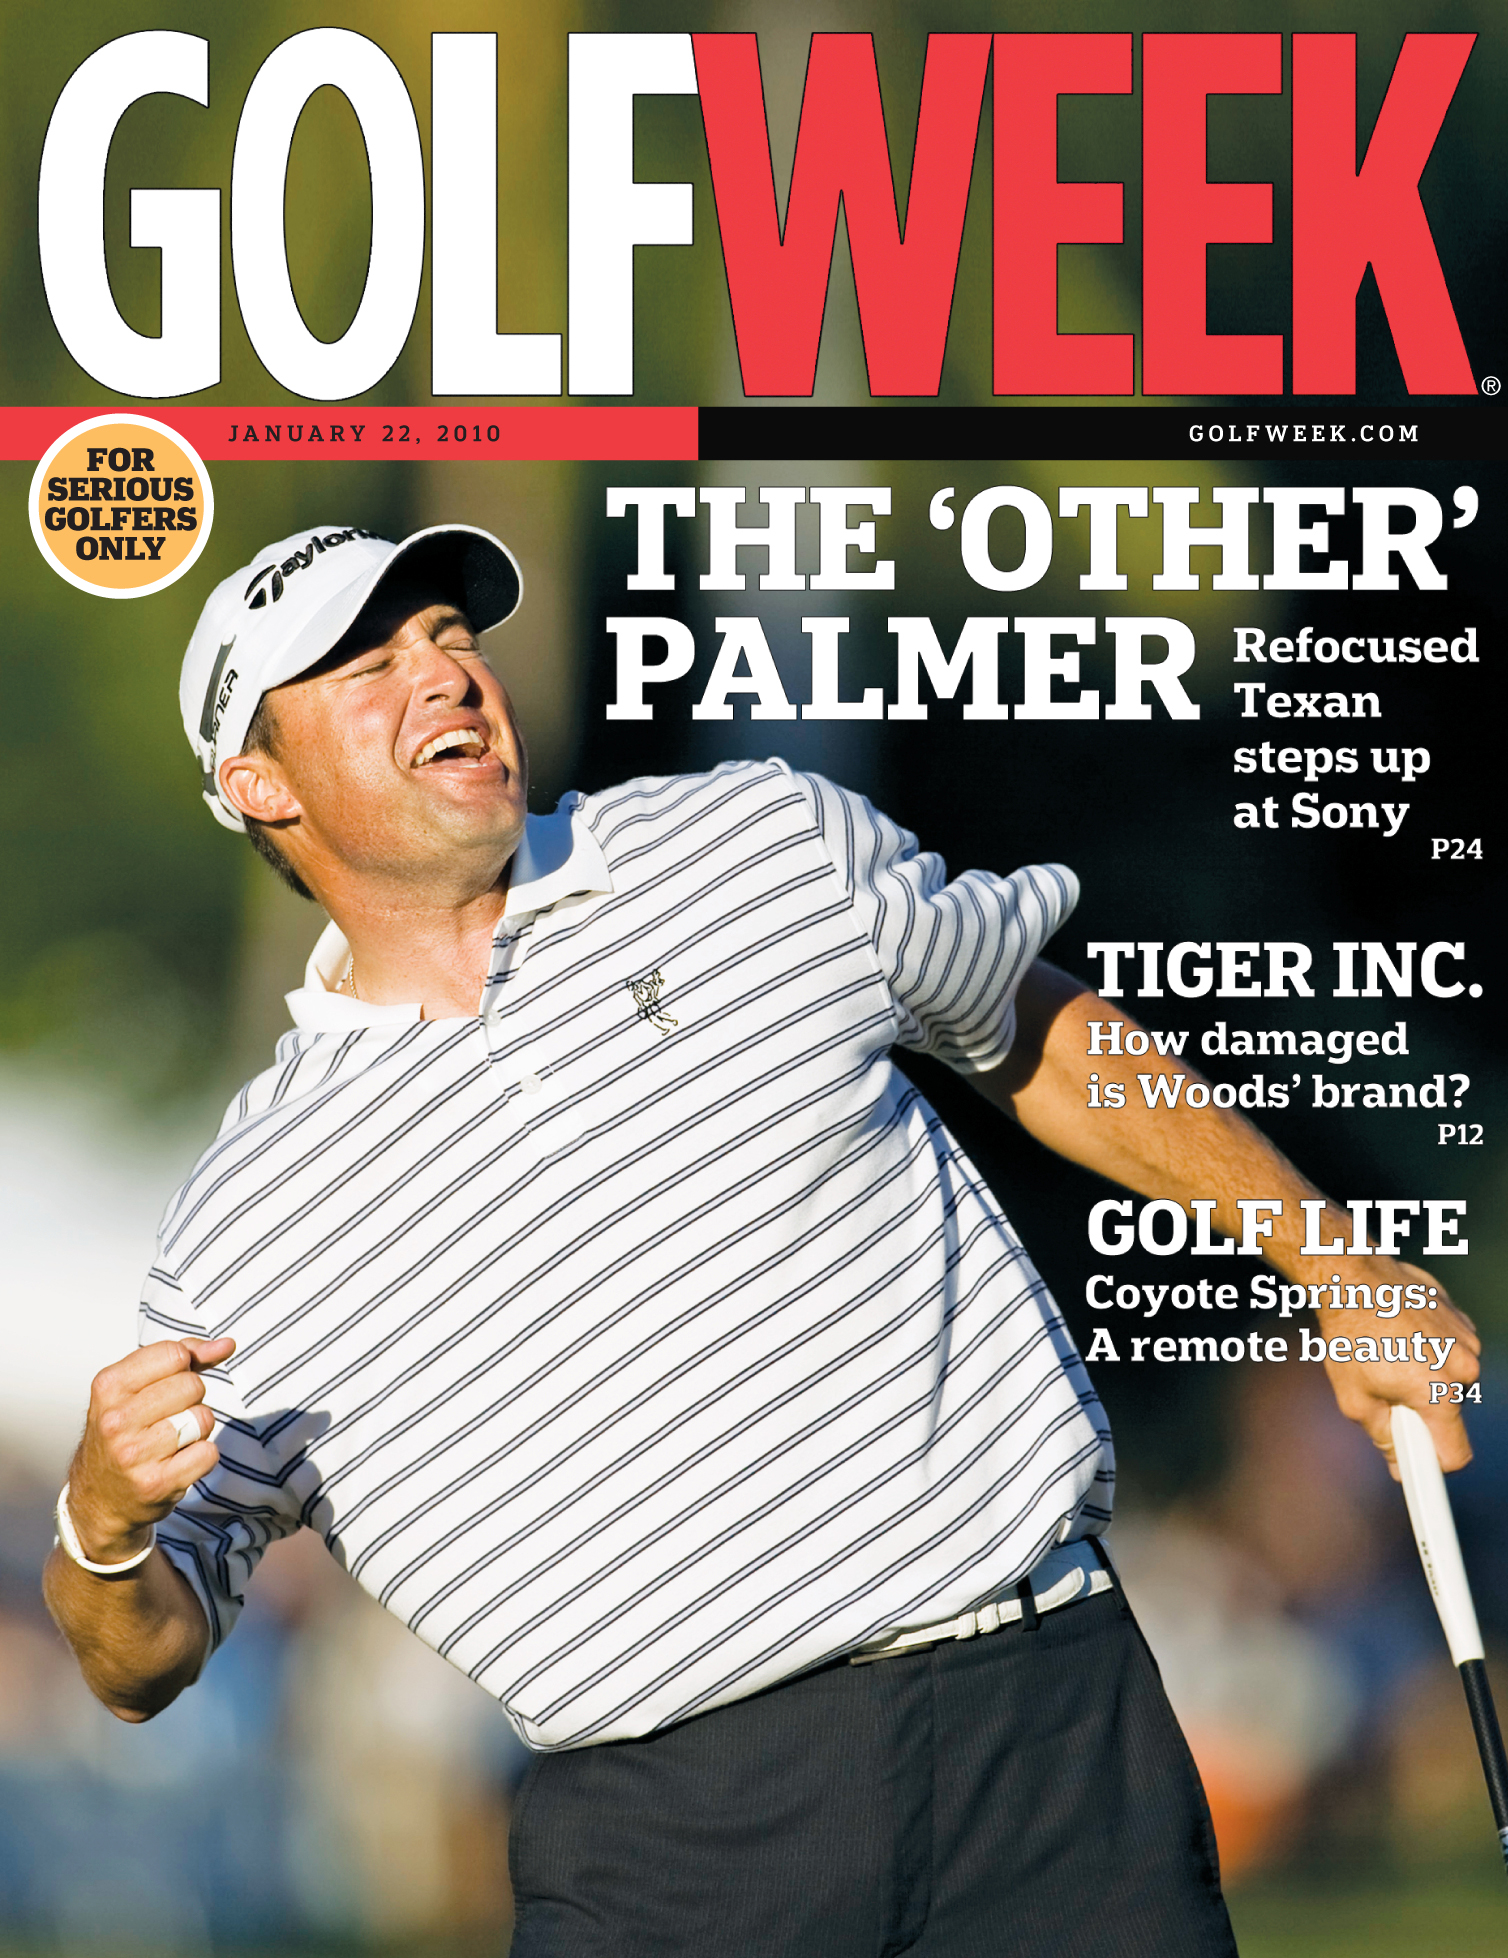 Golfweek (Jan. 22, 2010)